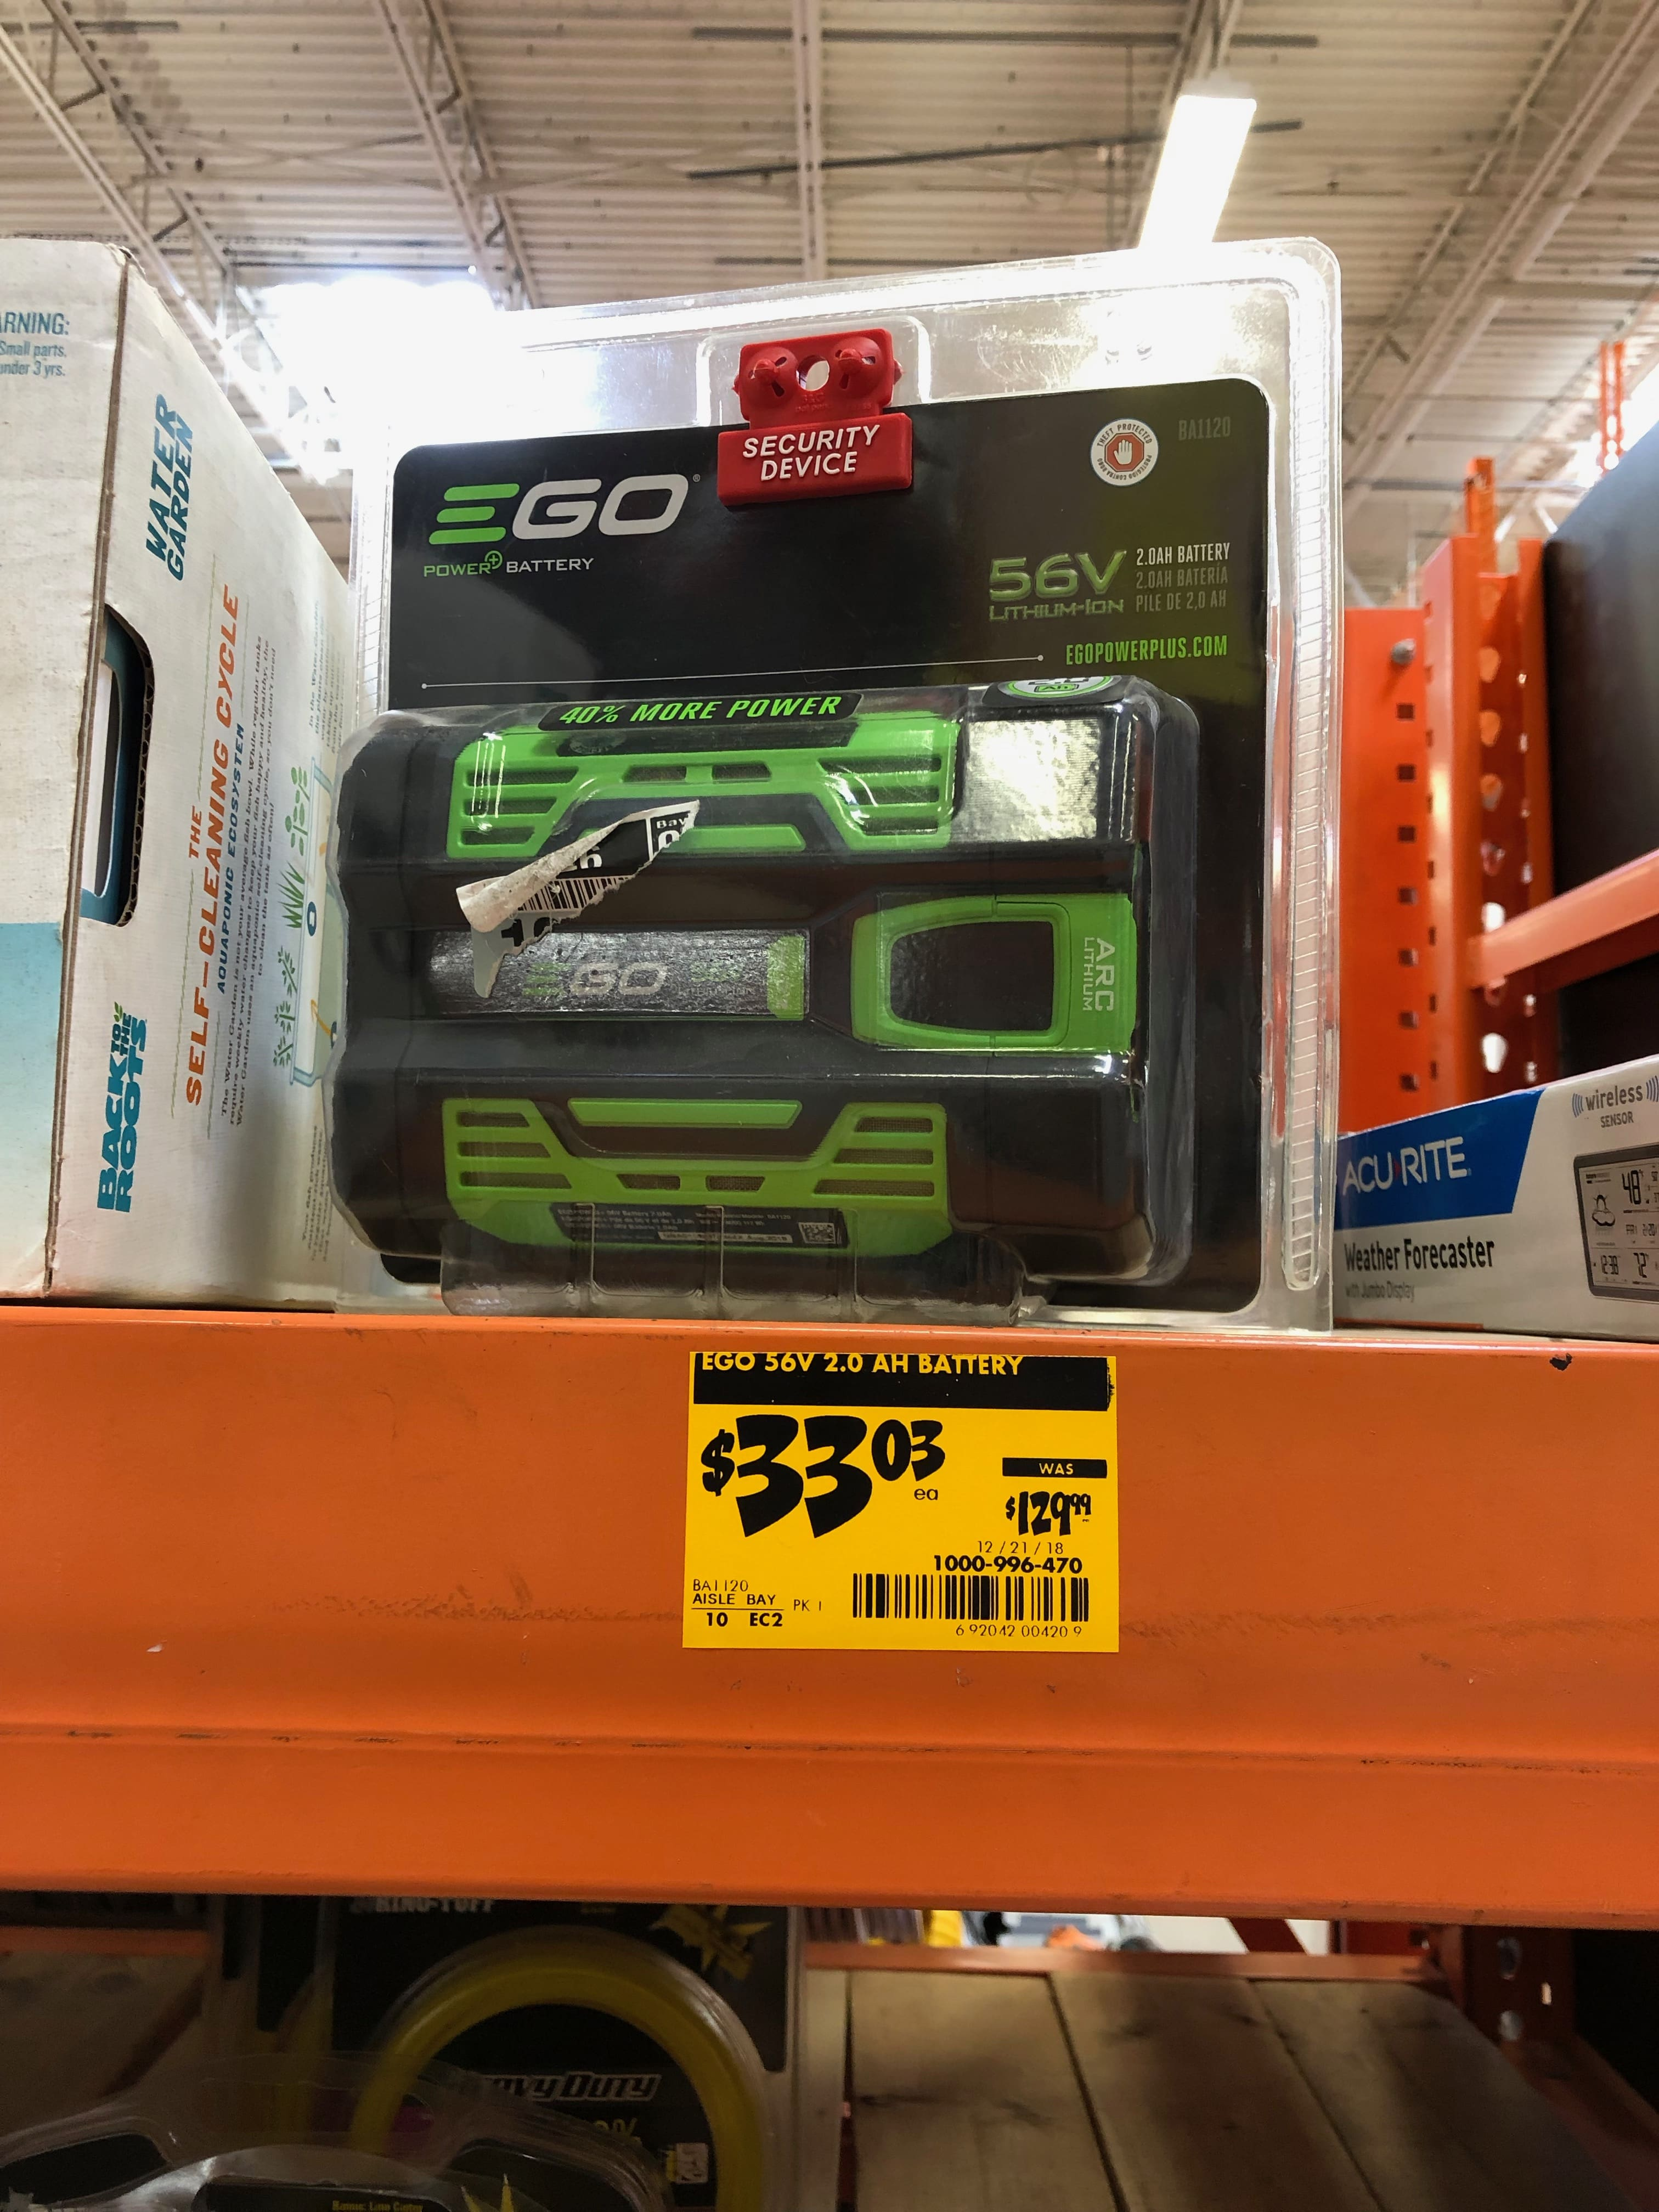 56-Volt 2.0 Ah Battery $33 at Home Depot YMMV